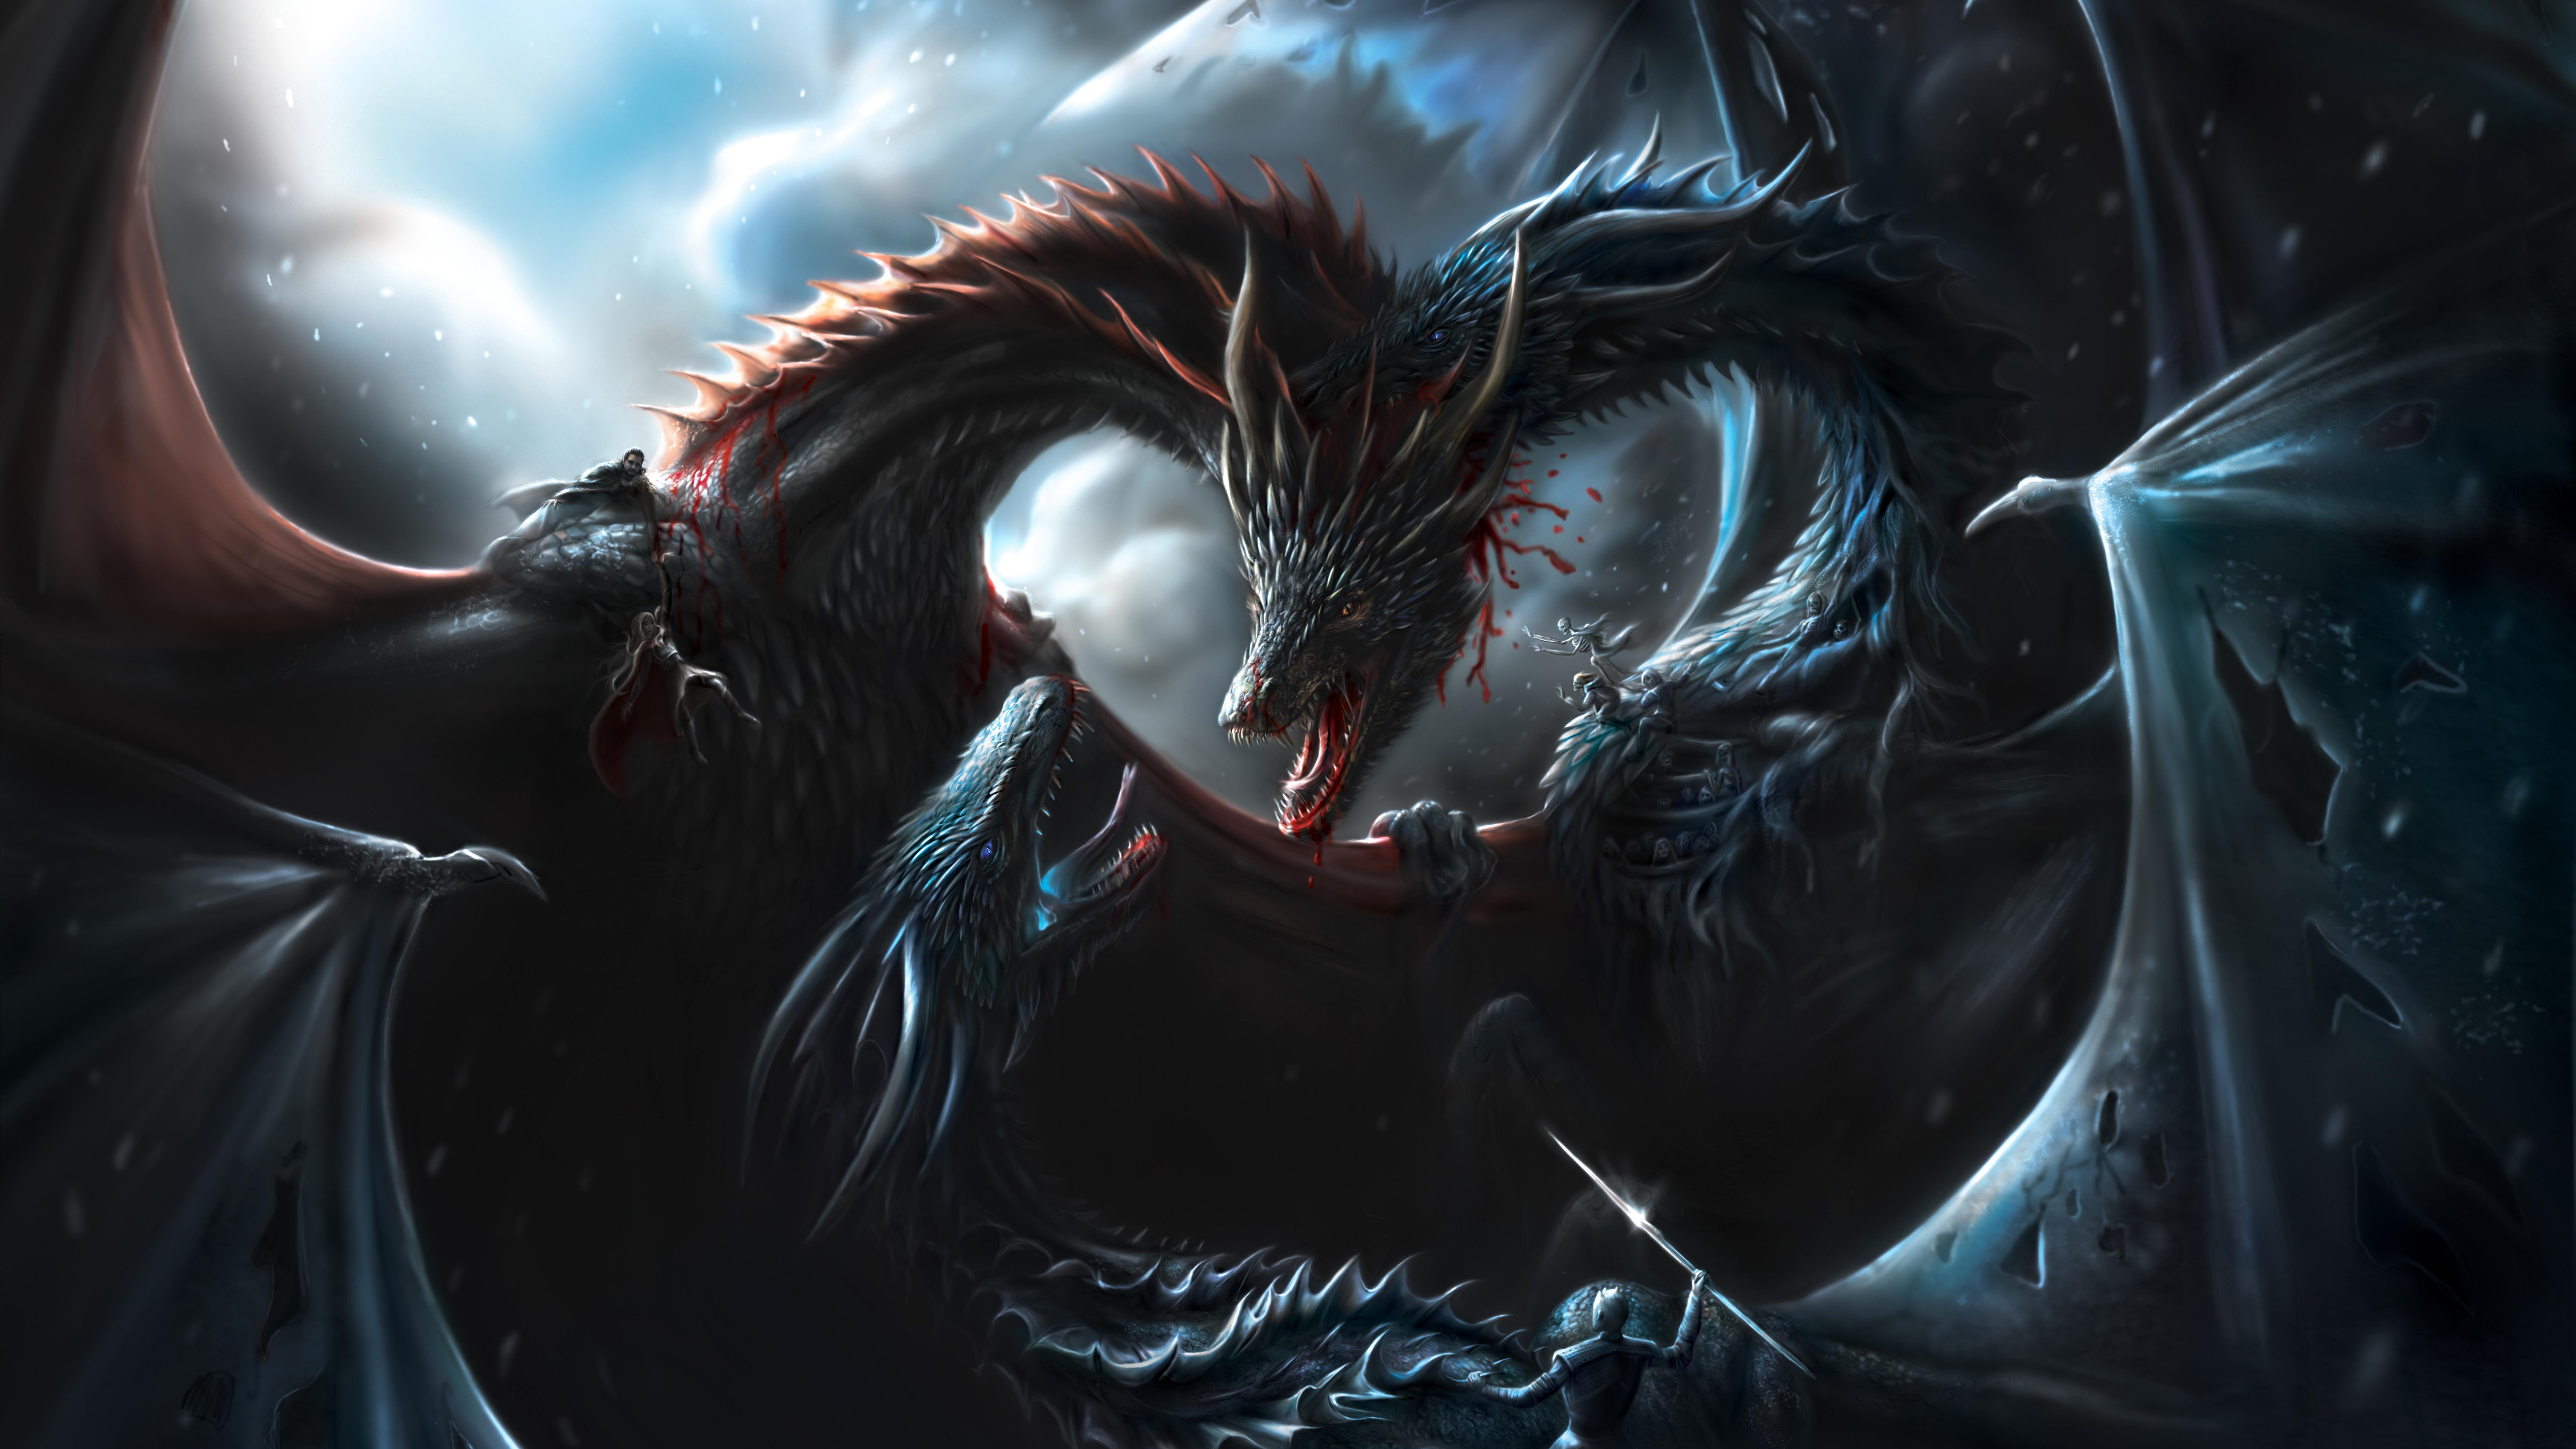 7680x4320 Battle Of Dragons Game Of Thrones 8k 8k HD 4k